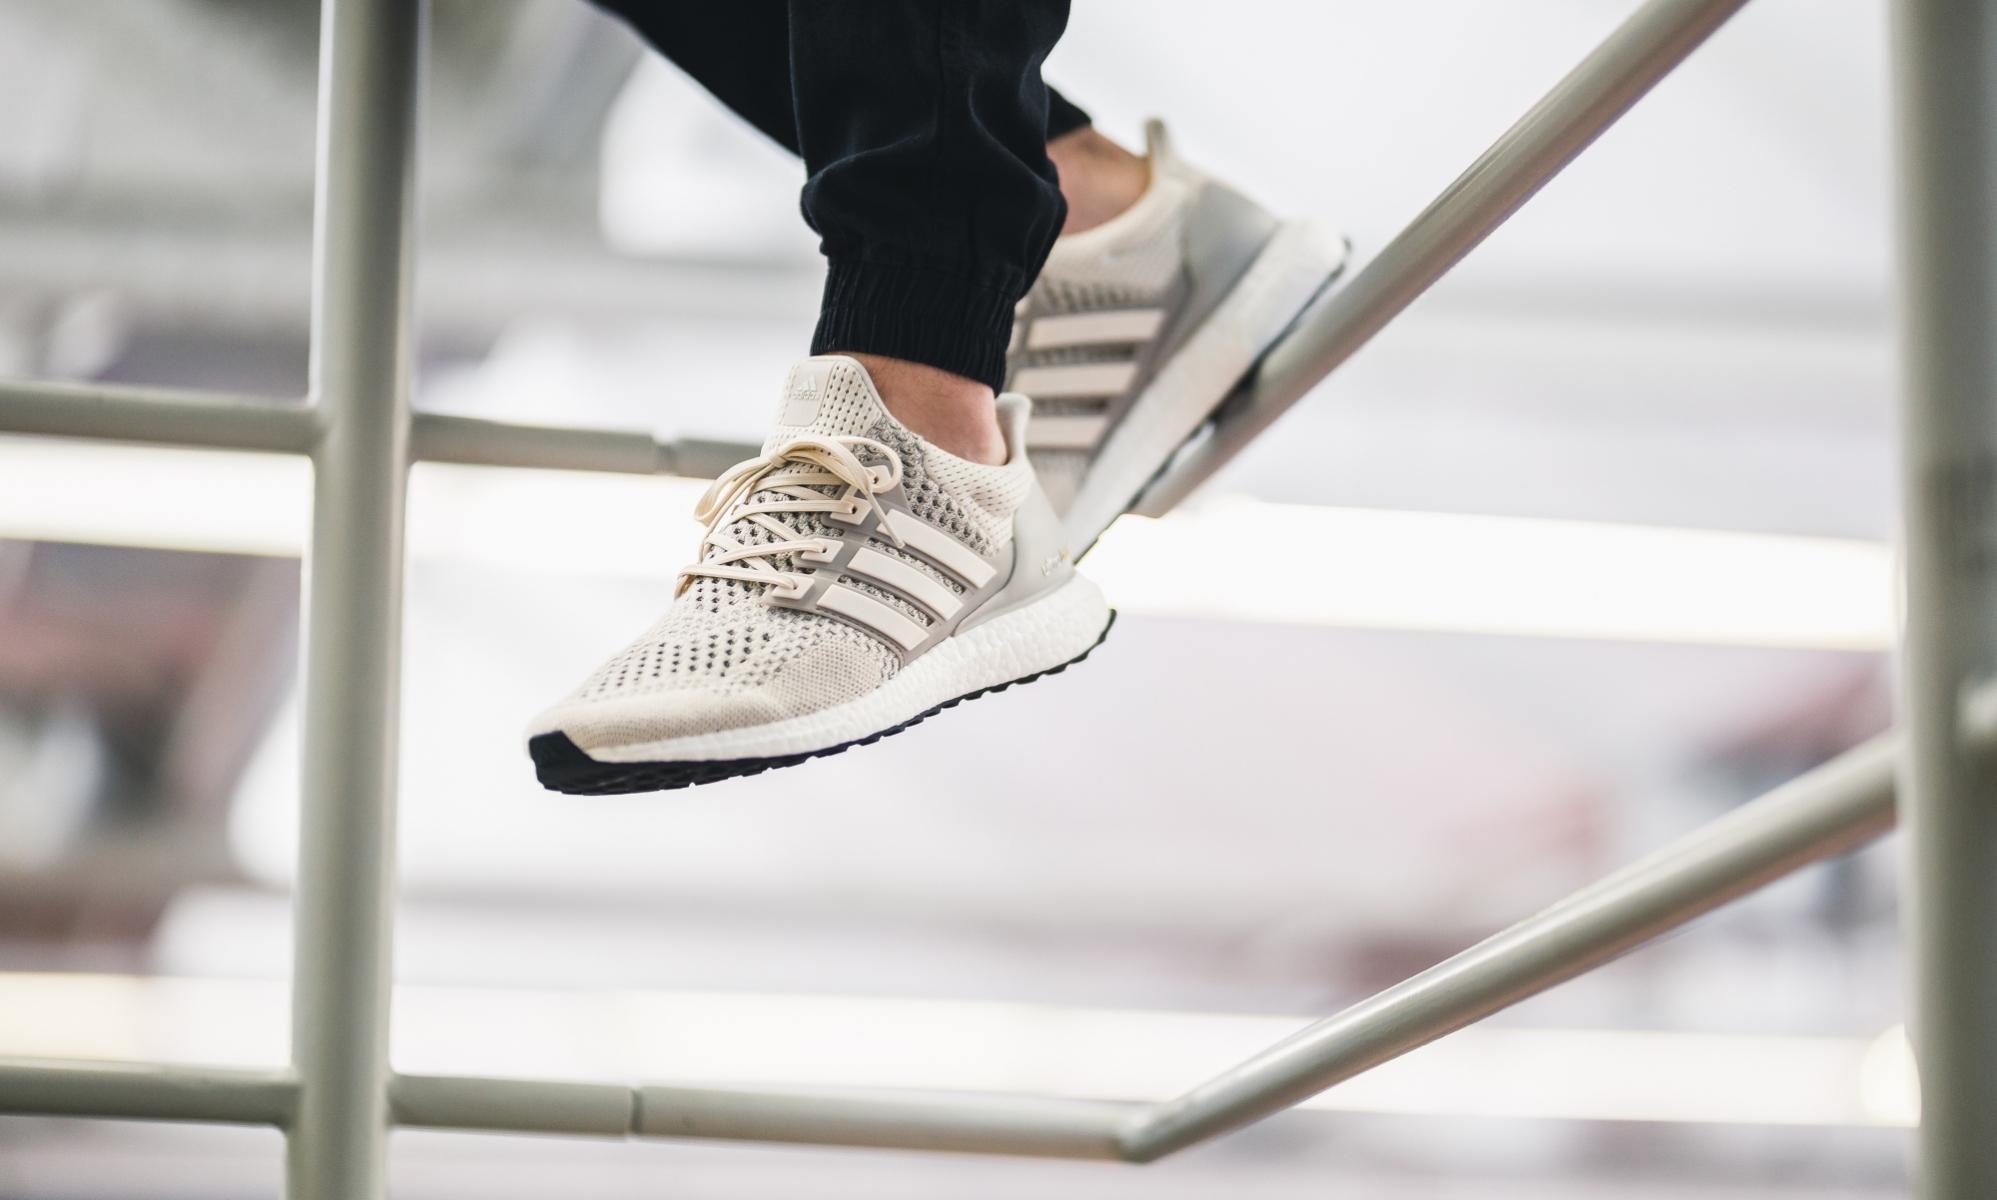 979d33923 adidas-ultraboost-ltd-cream-legacy-pack-beige-white-bb7802-mood-1 ...